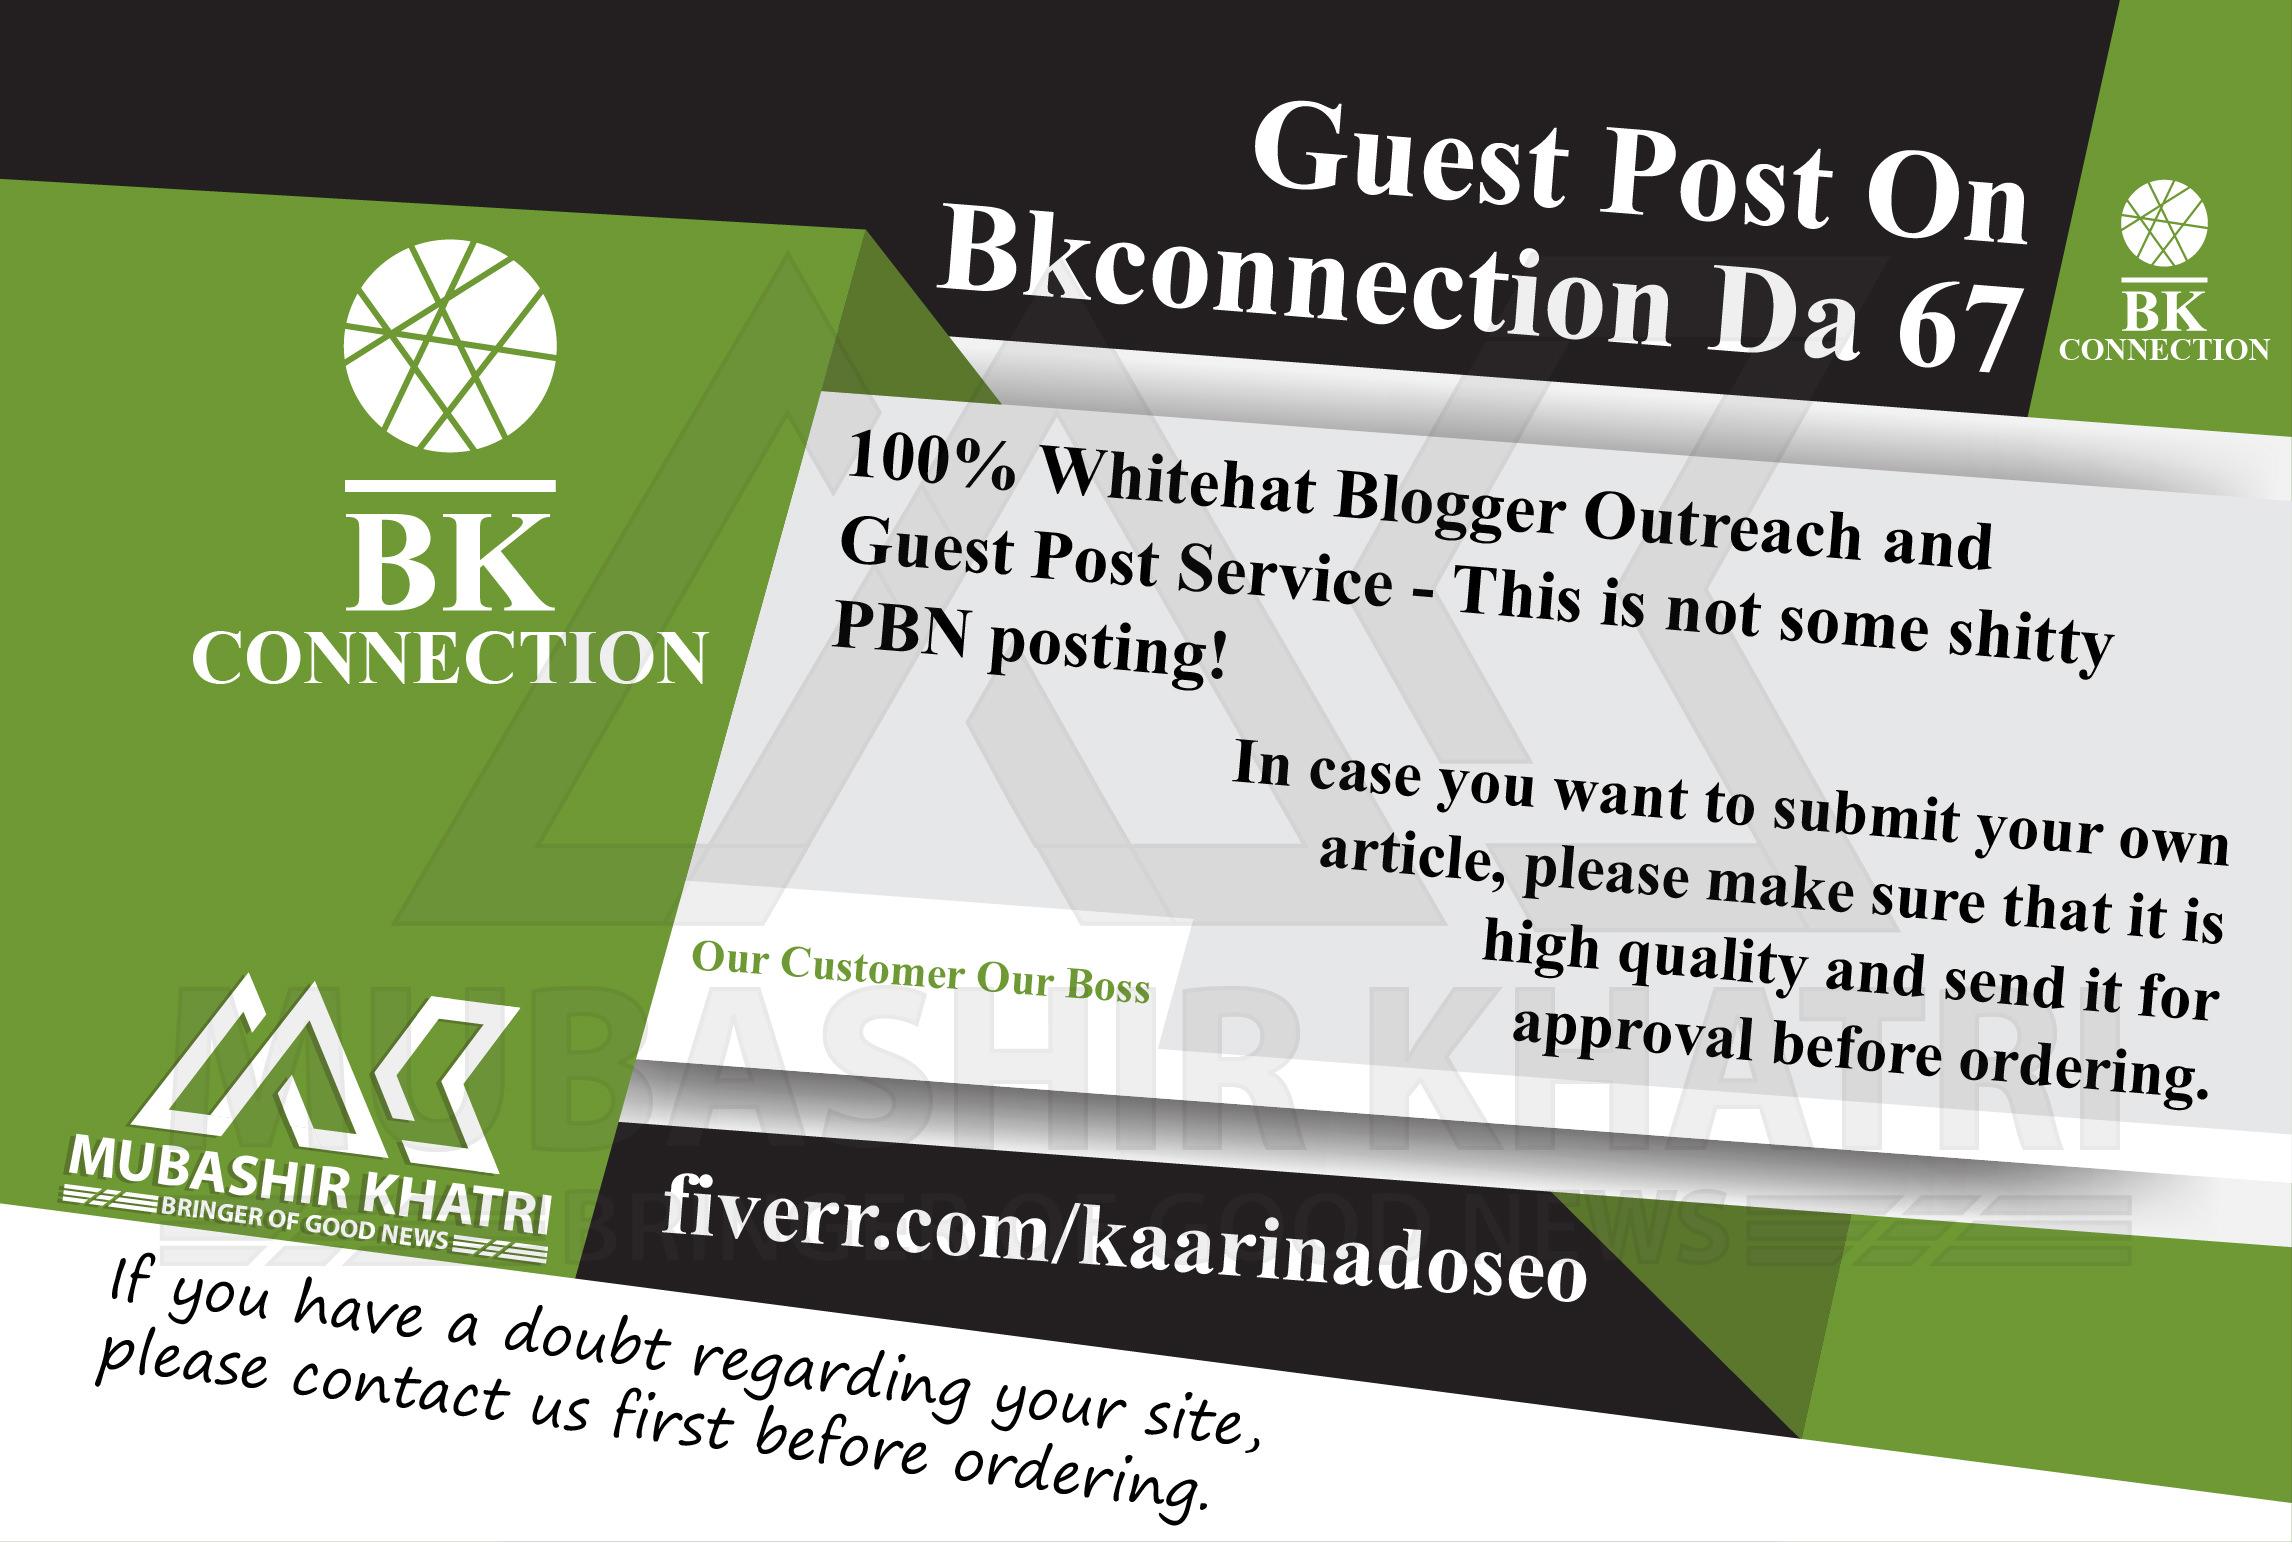 Provide Guest Post On Bkconnection. com Bkconnection DA 67